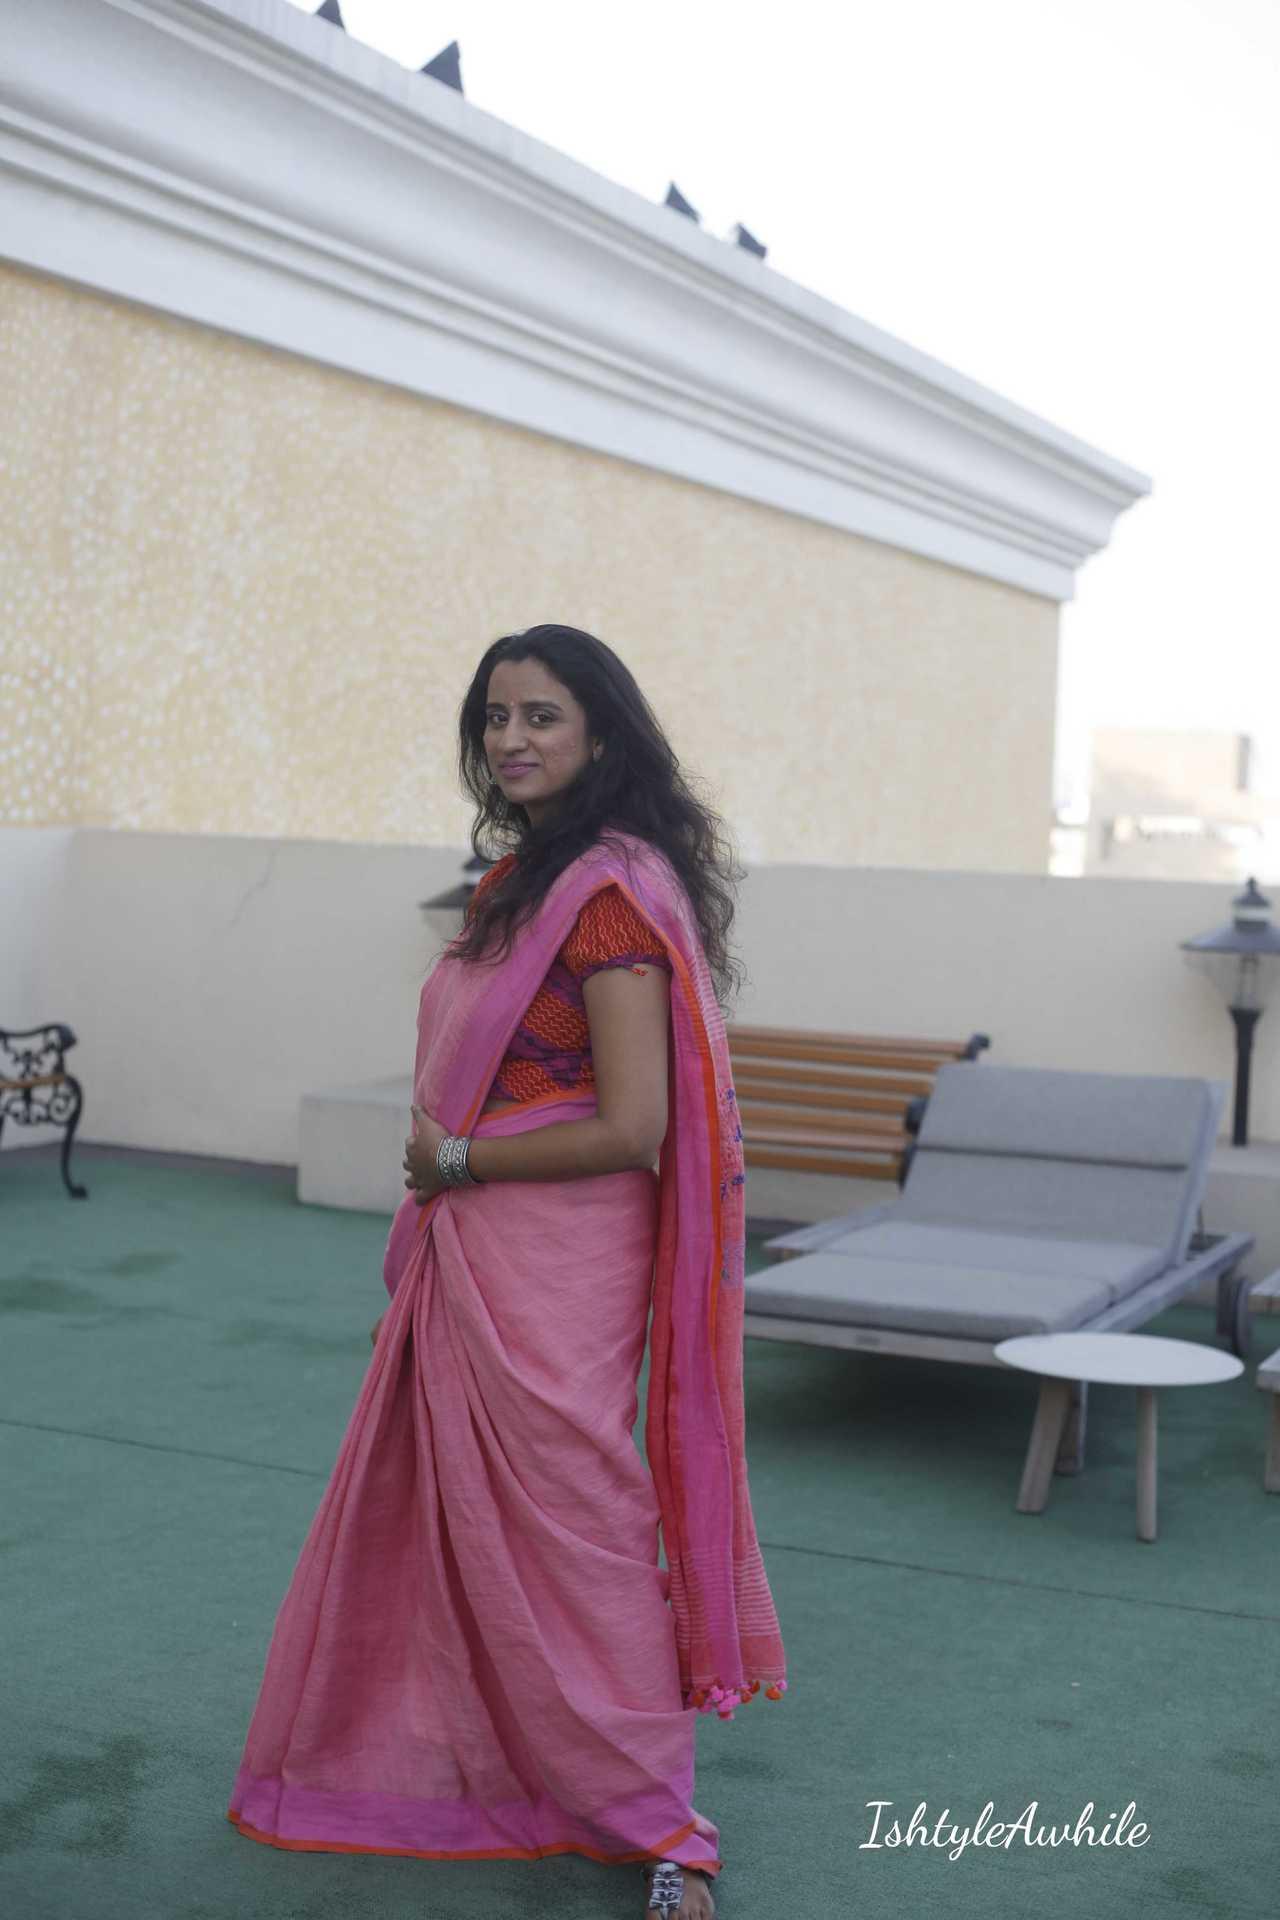 IshtyleAwhile - ekdori shop online for handloom sarees